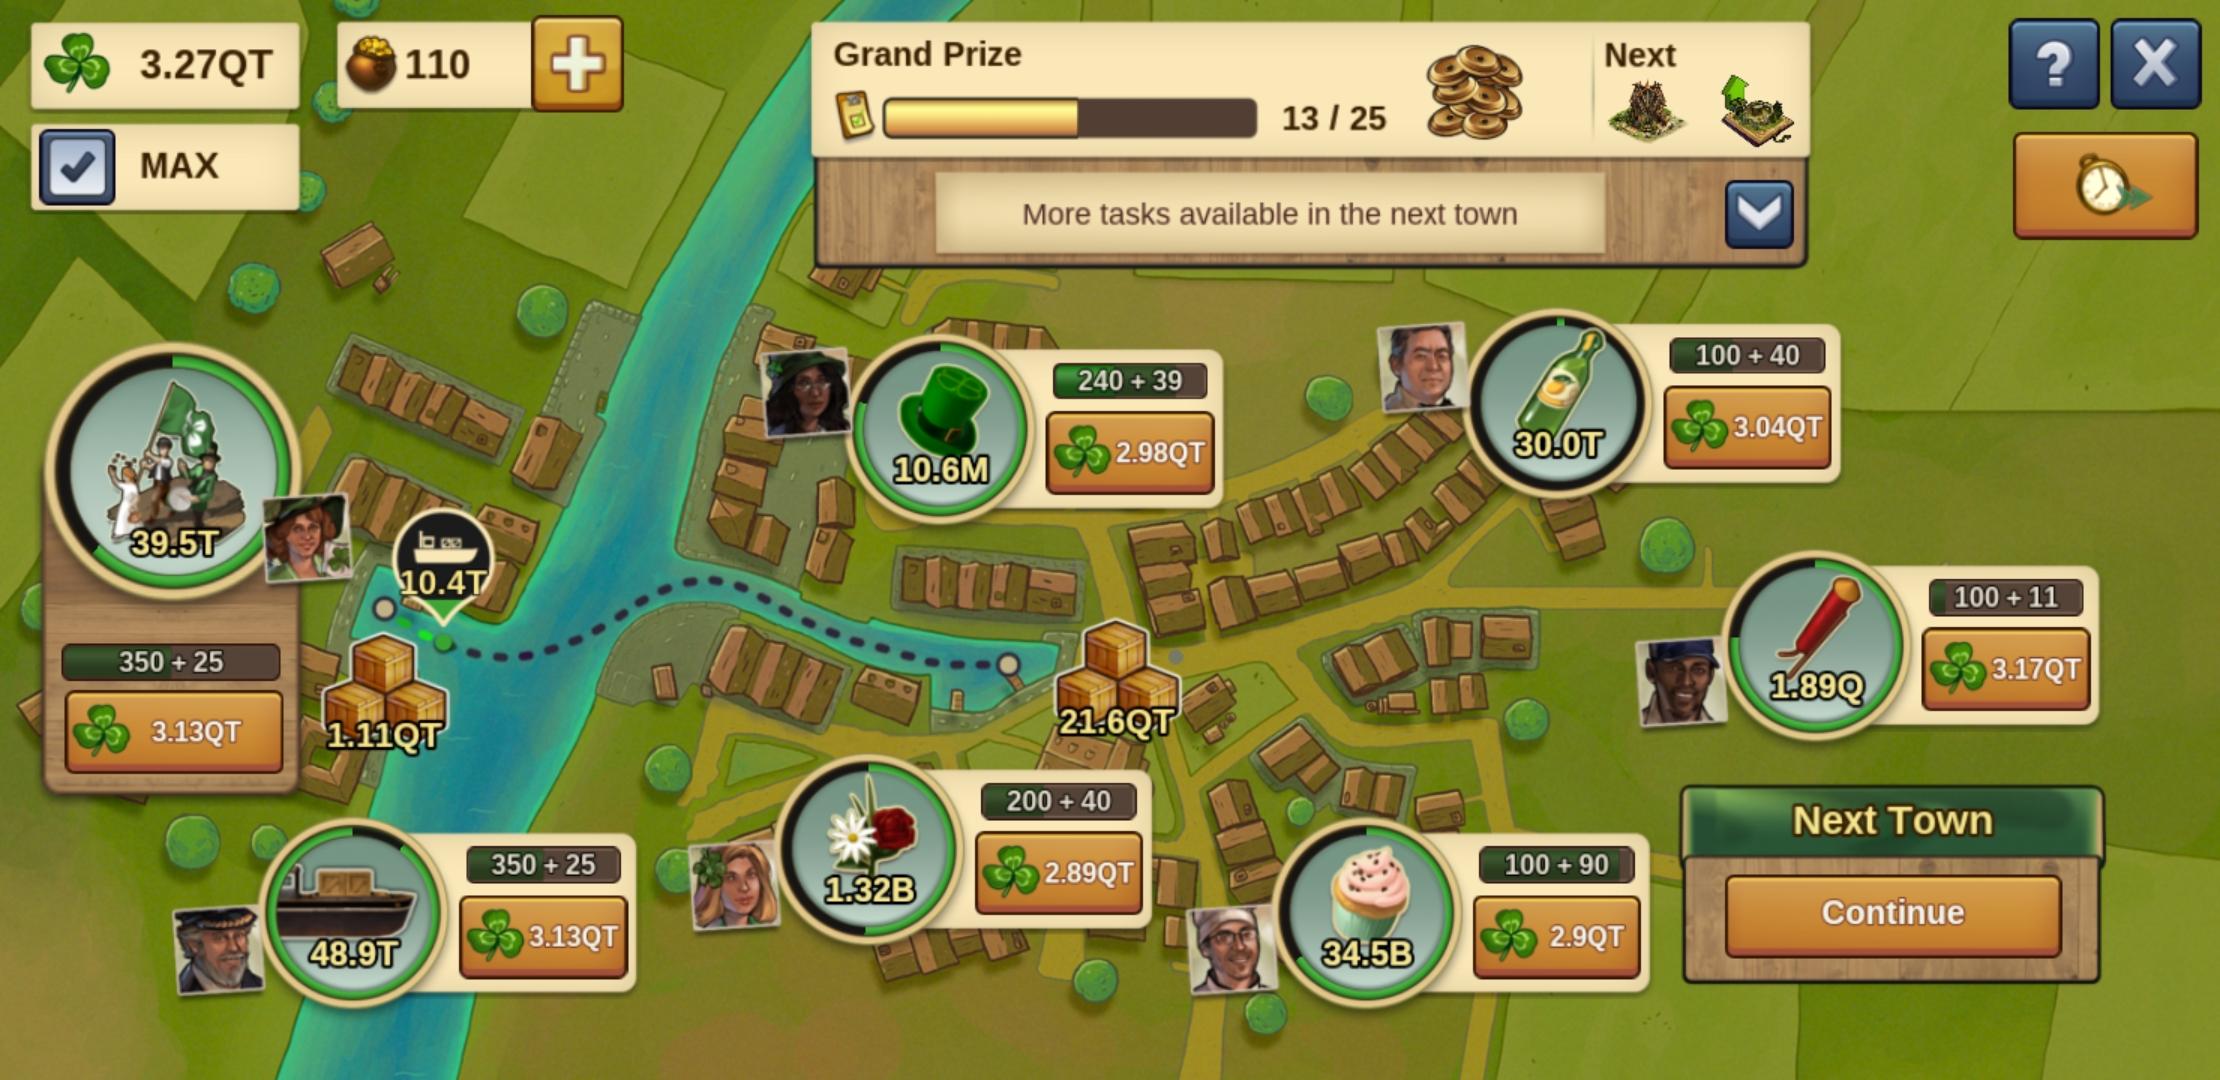 Screenshot_20210311-084431_Forge of Empires.jpg